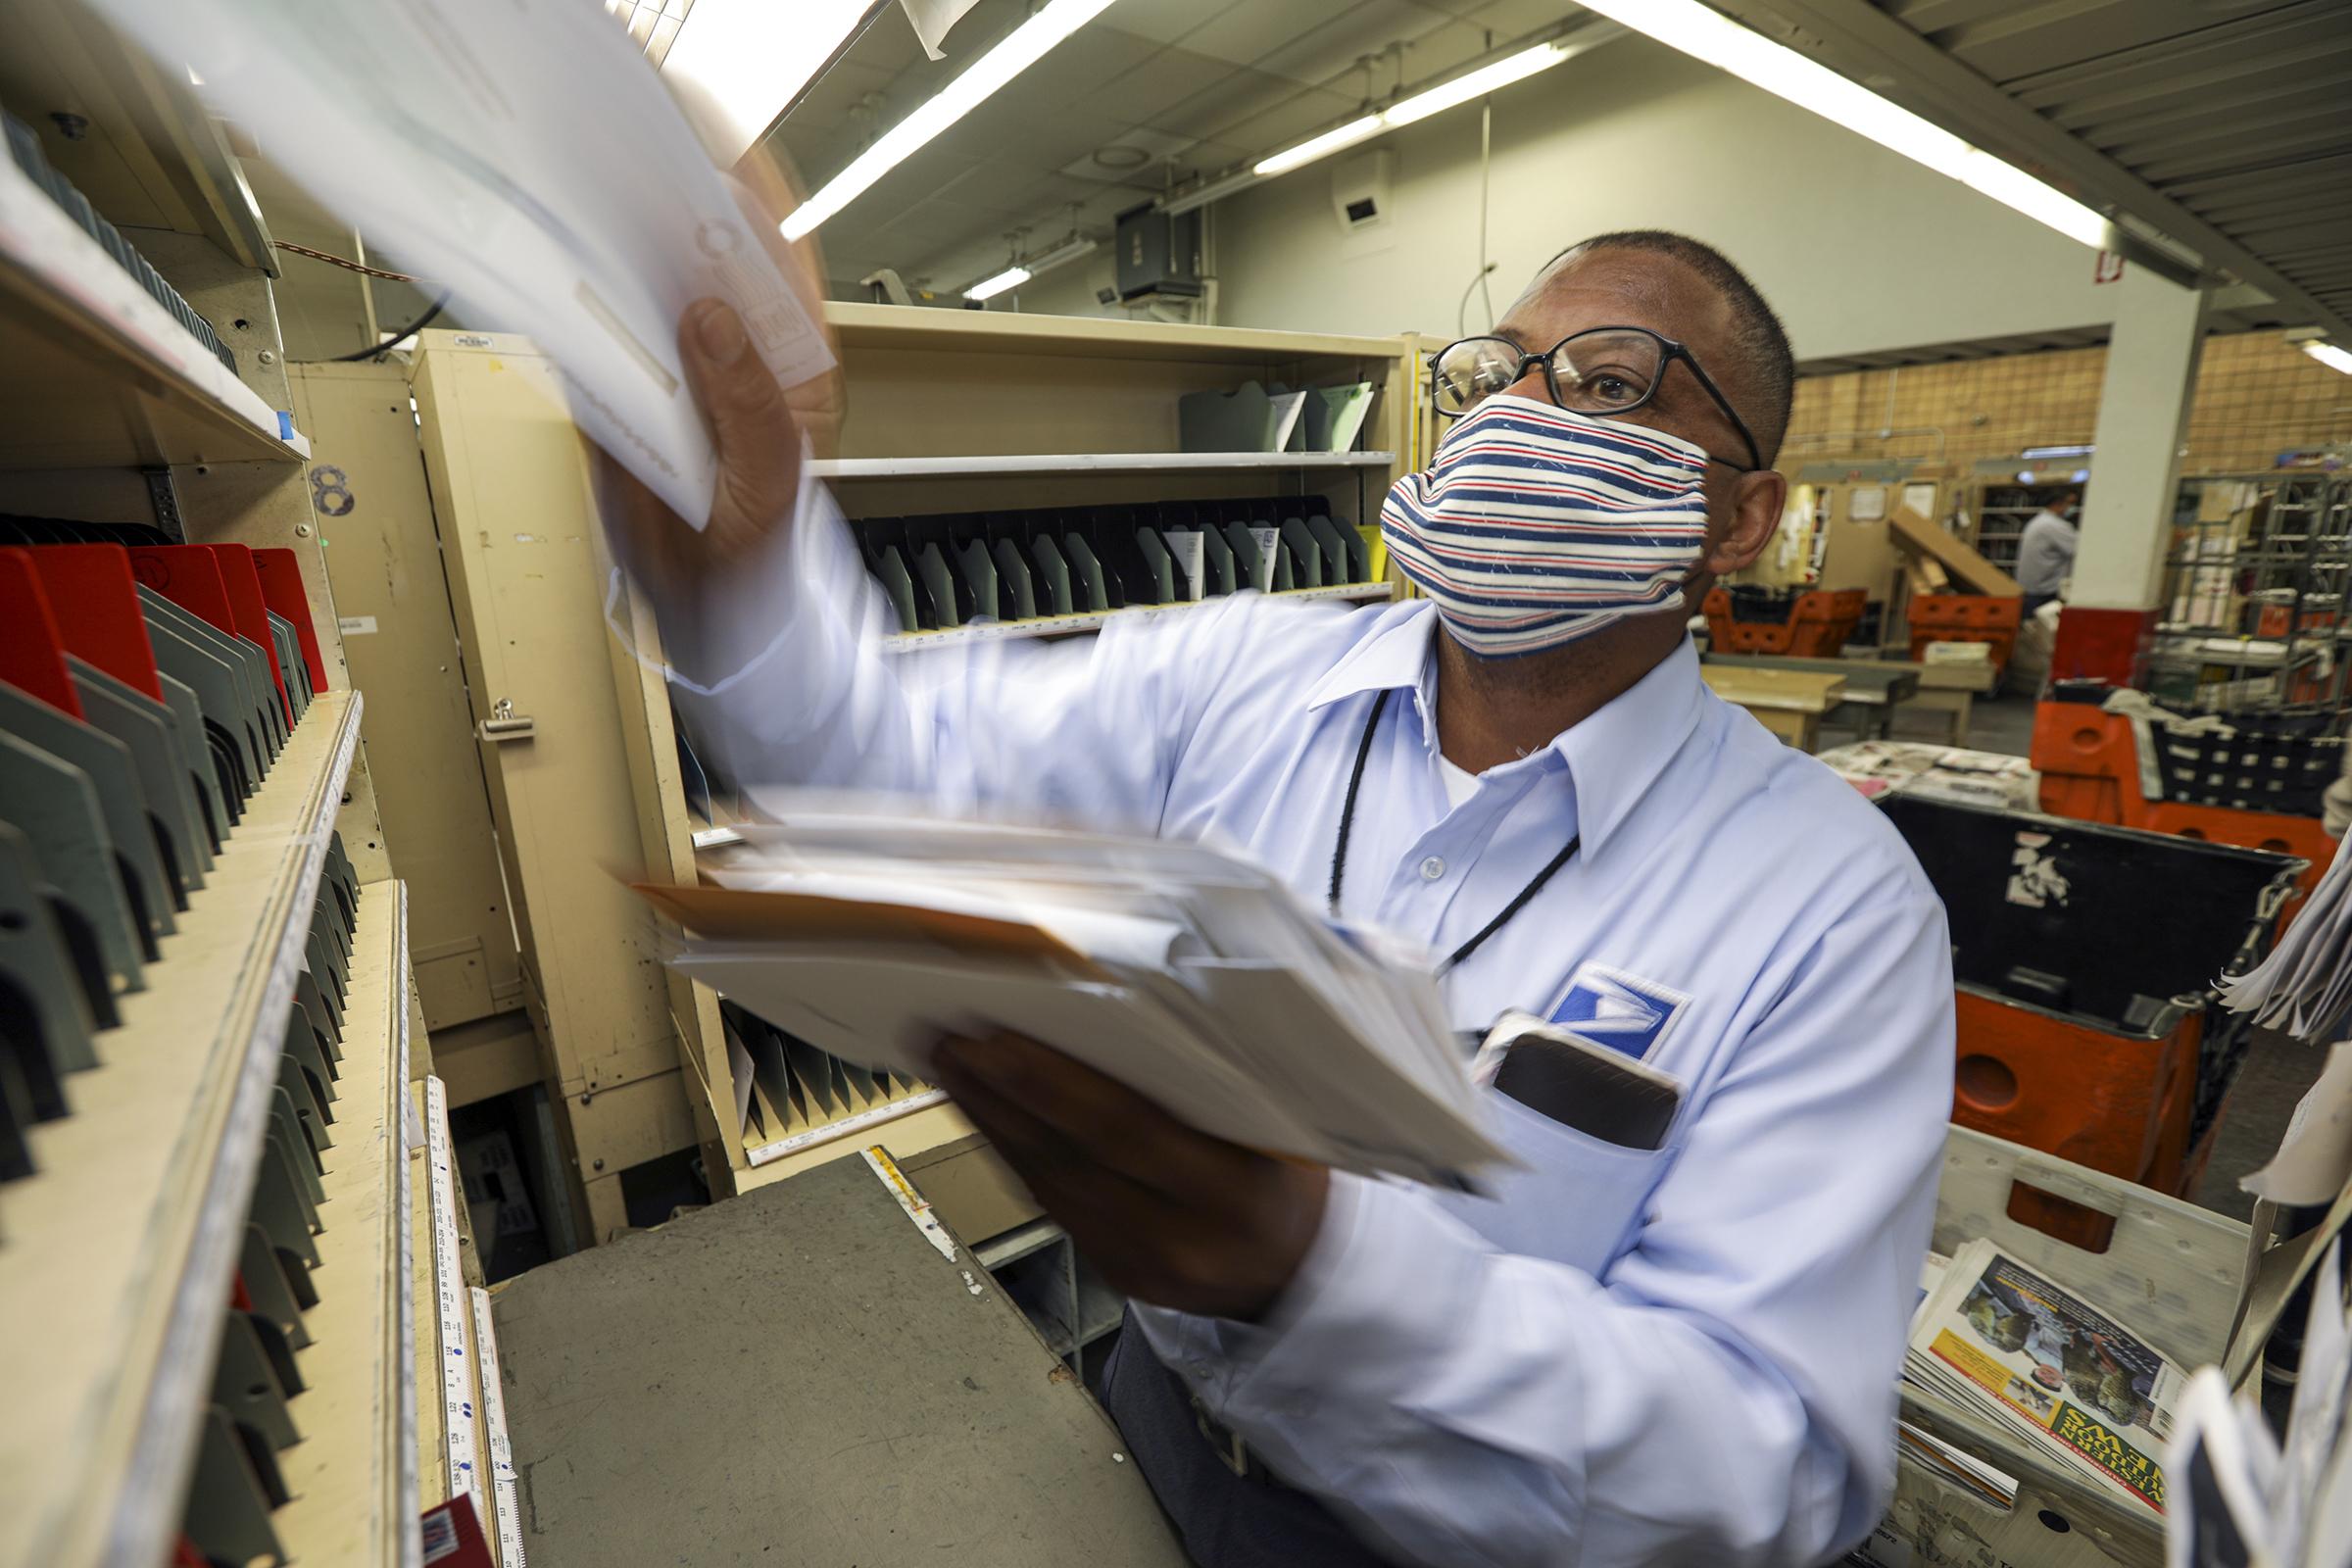 Federal agencies told to return masks indoors despite vaccination status